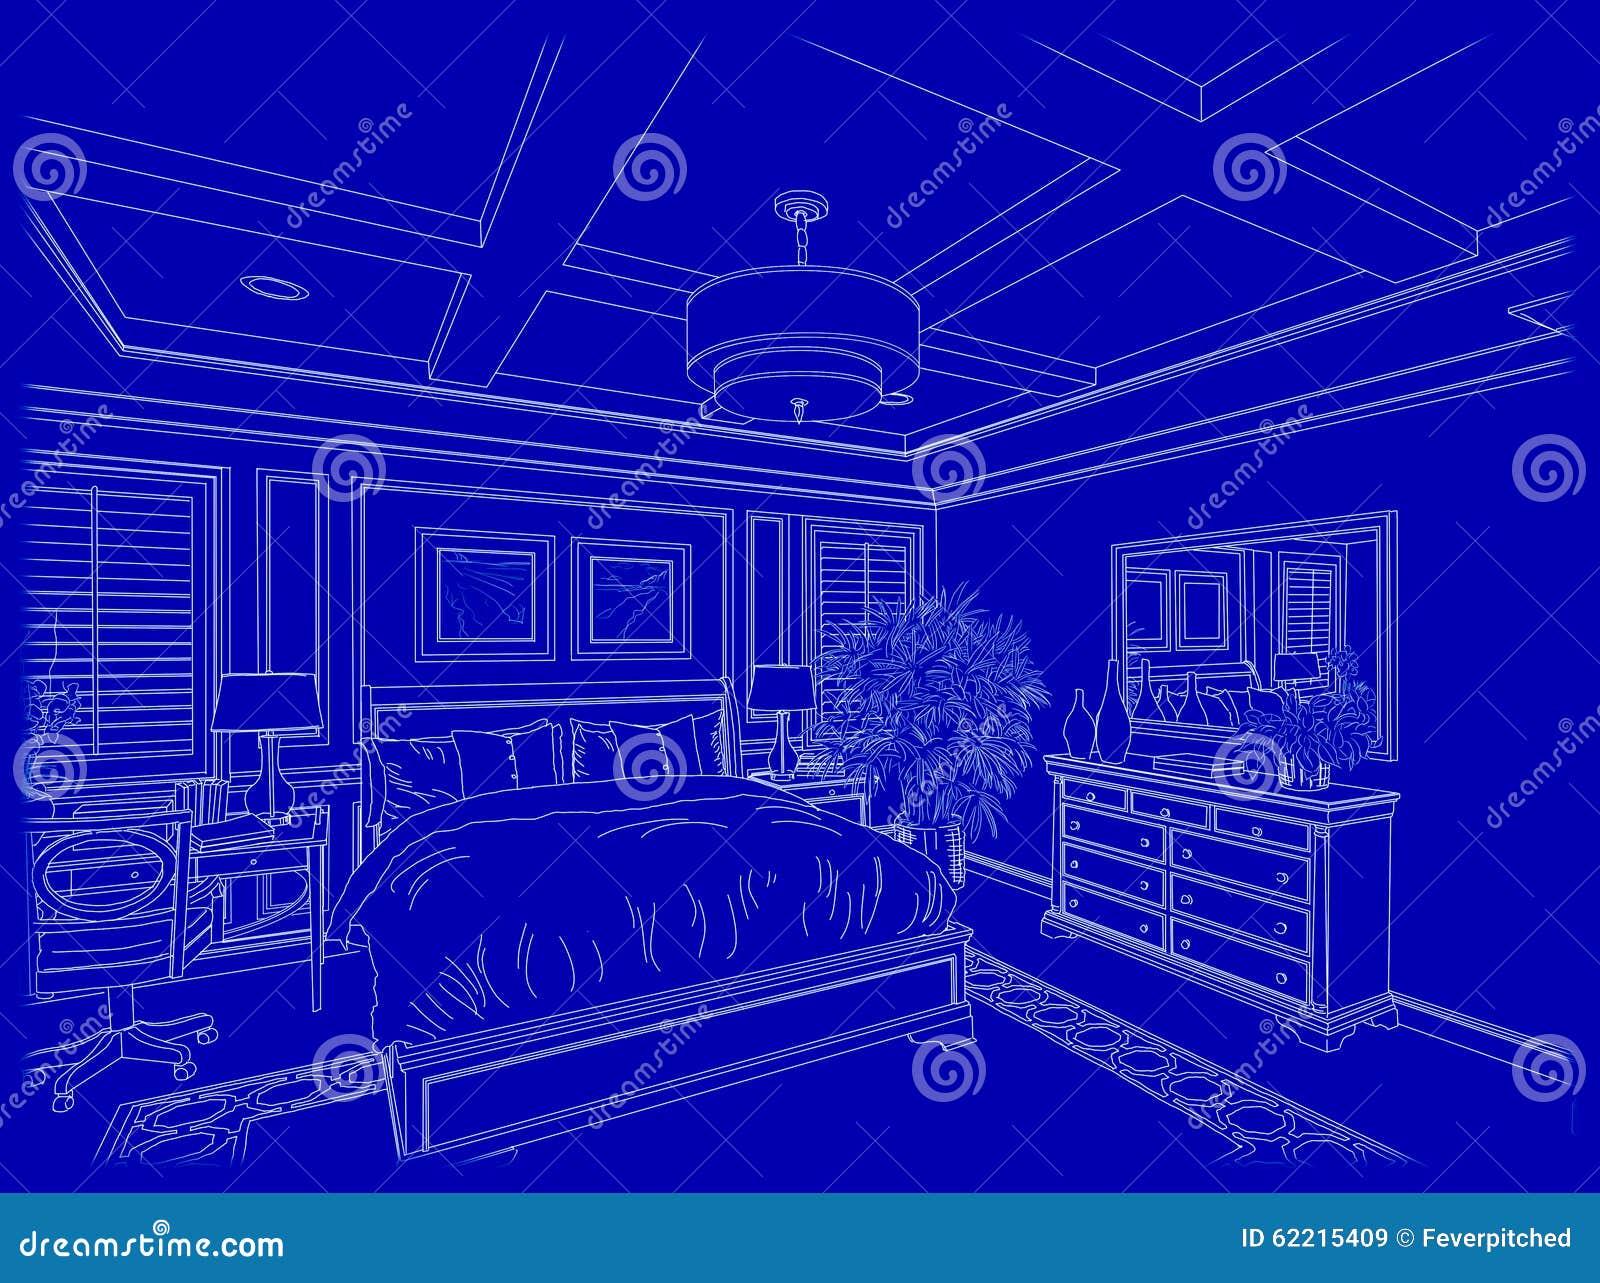 custom os blueprint wallpapers - photo #23